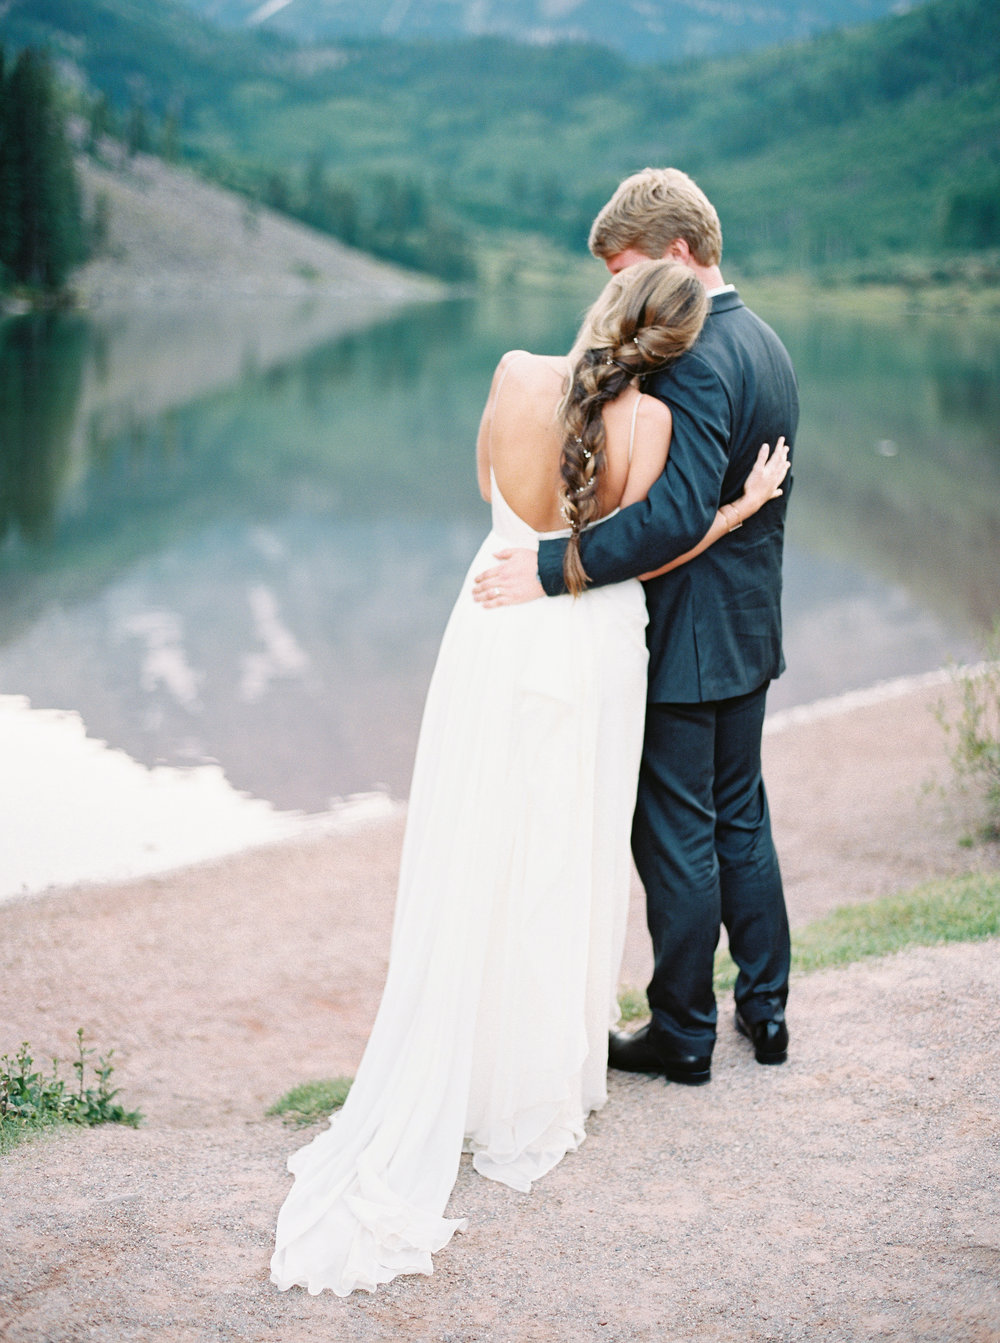 ashley-sawtelle-aspen-wedding-photographer-0118.jpg